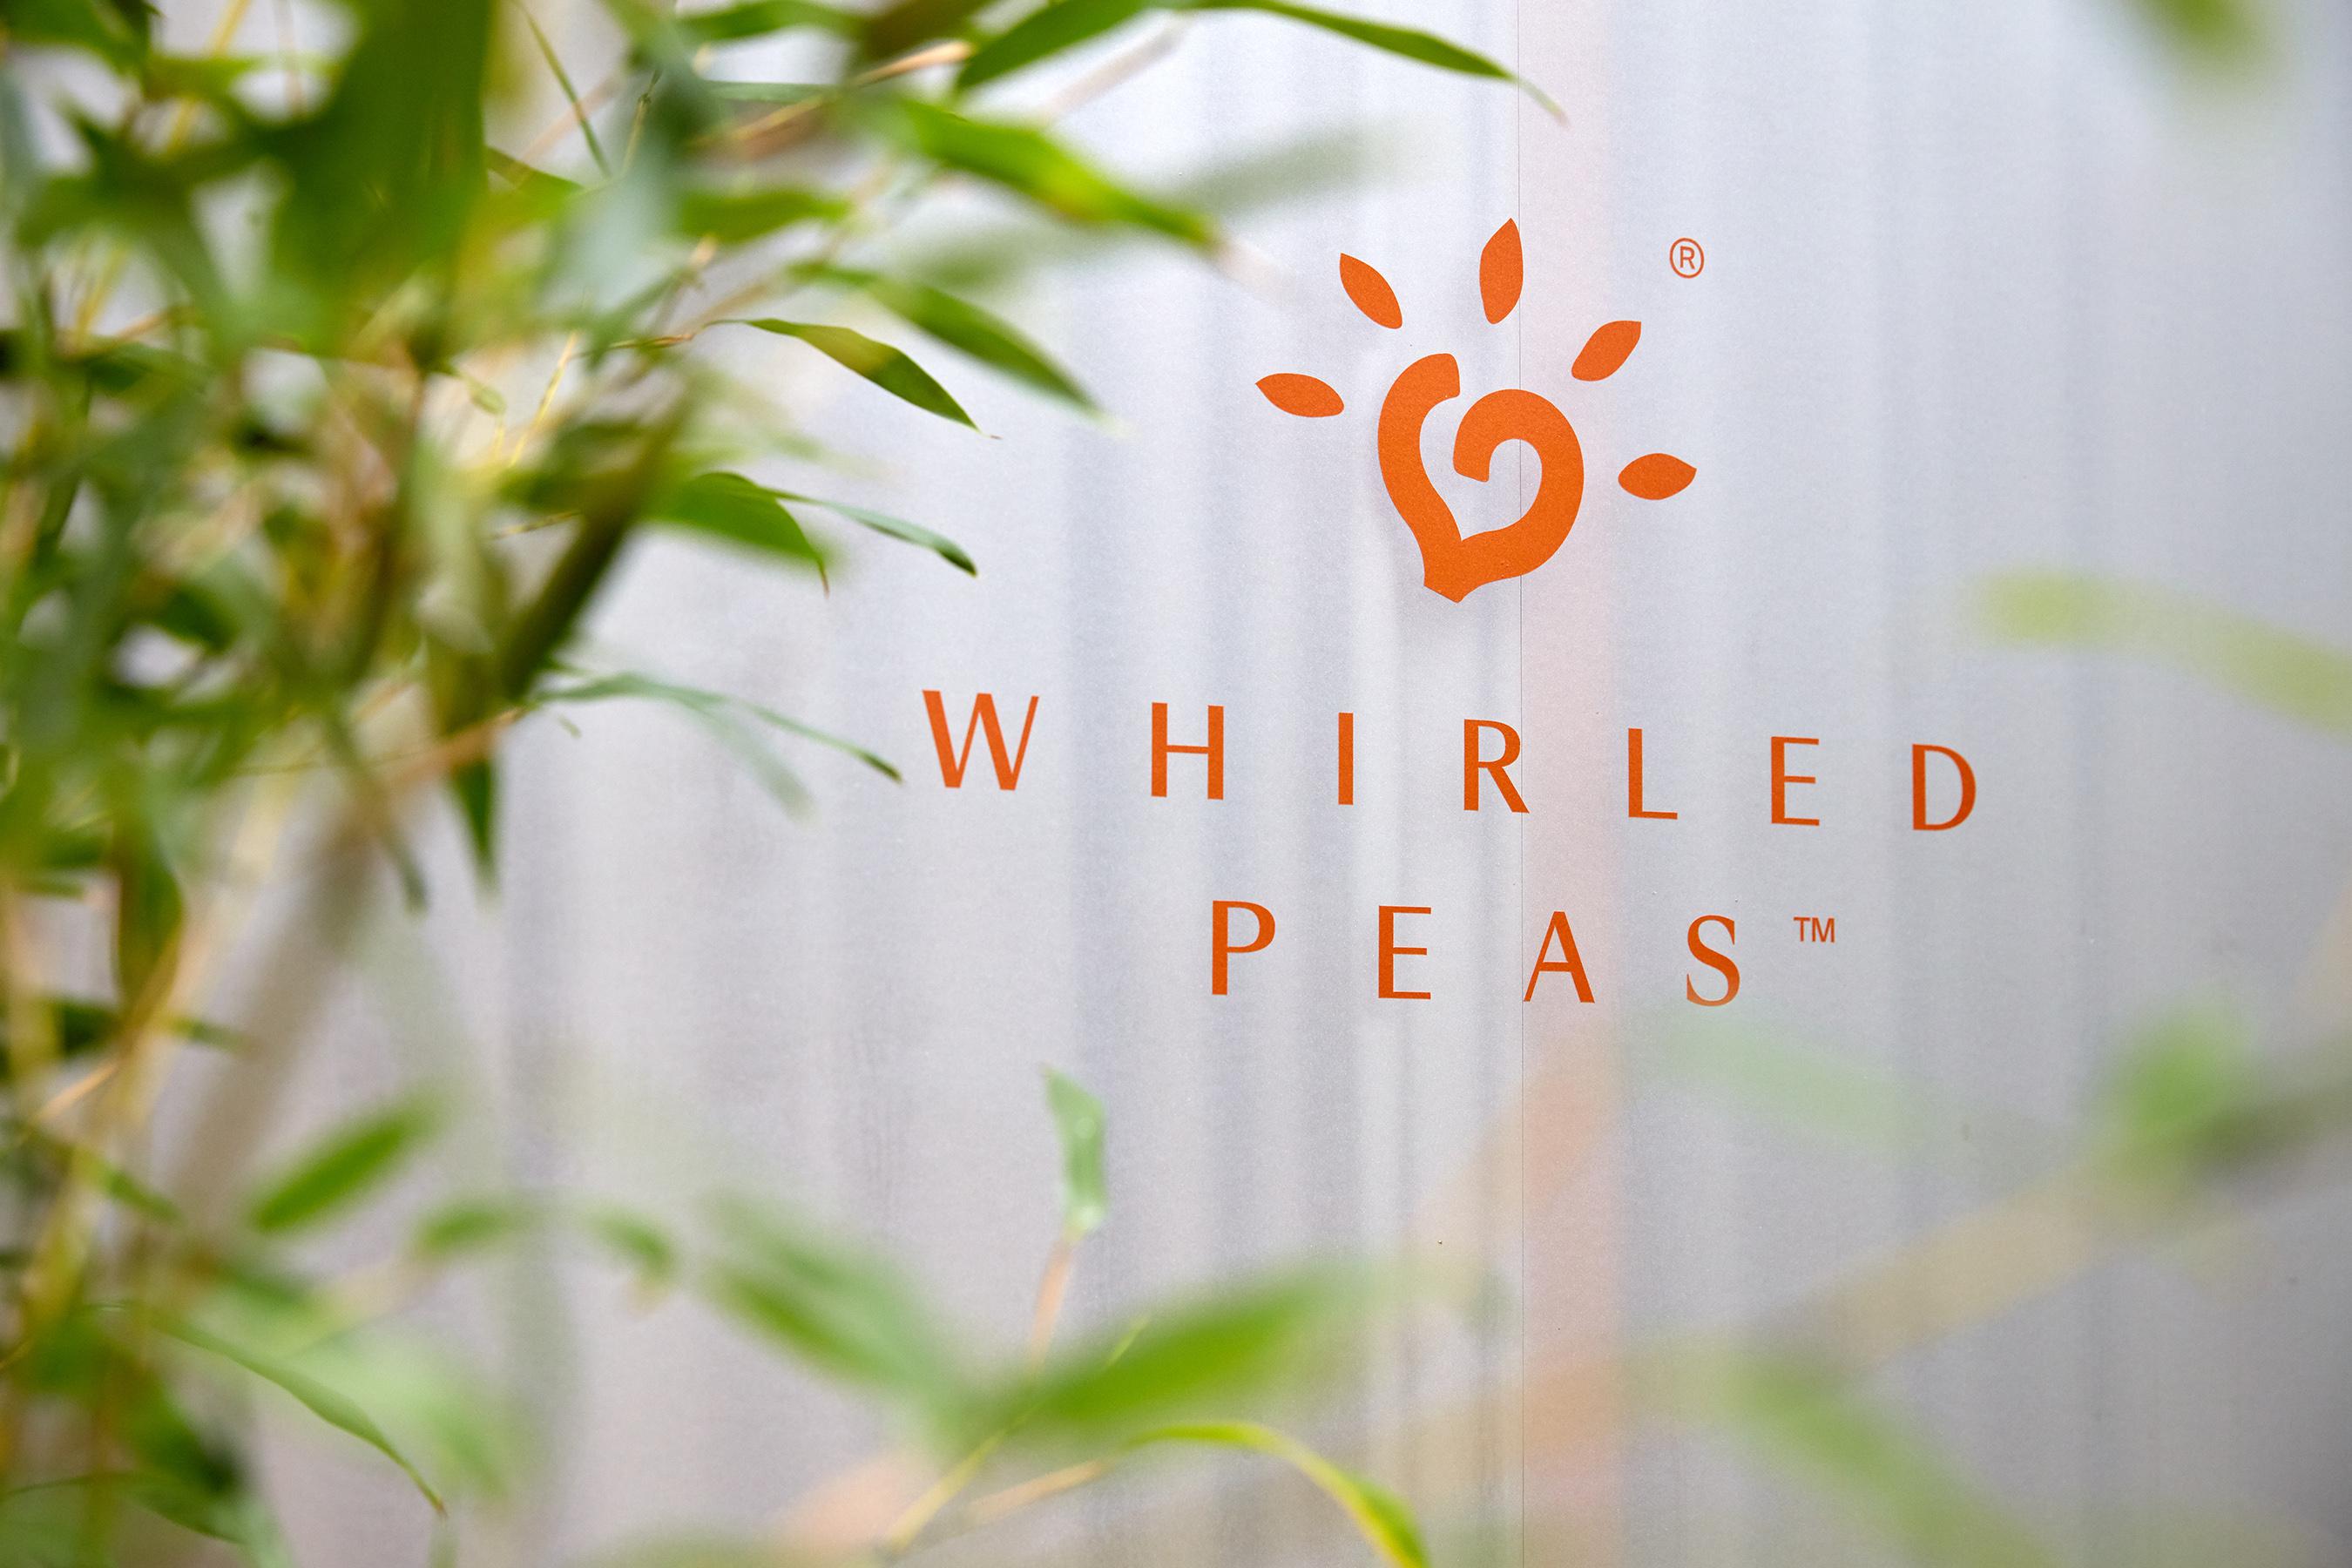 Whirled Peas Presented by Sabra